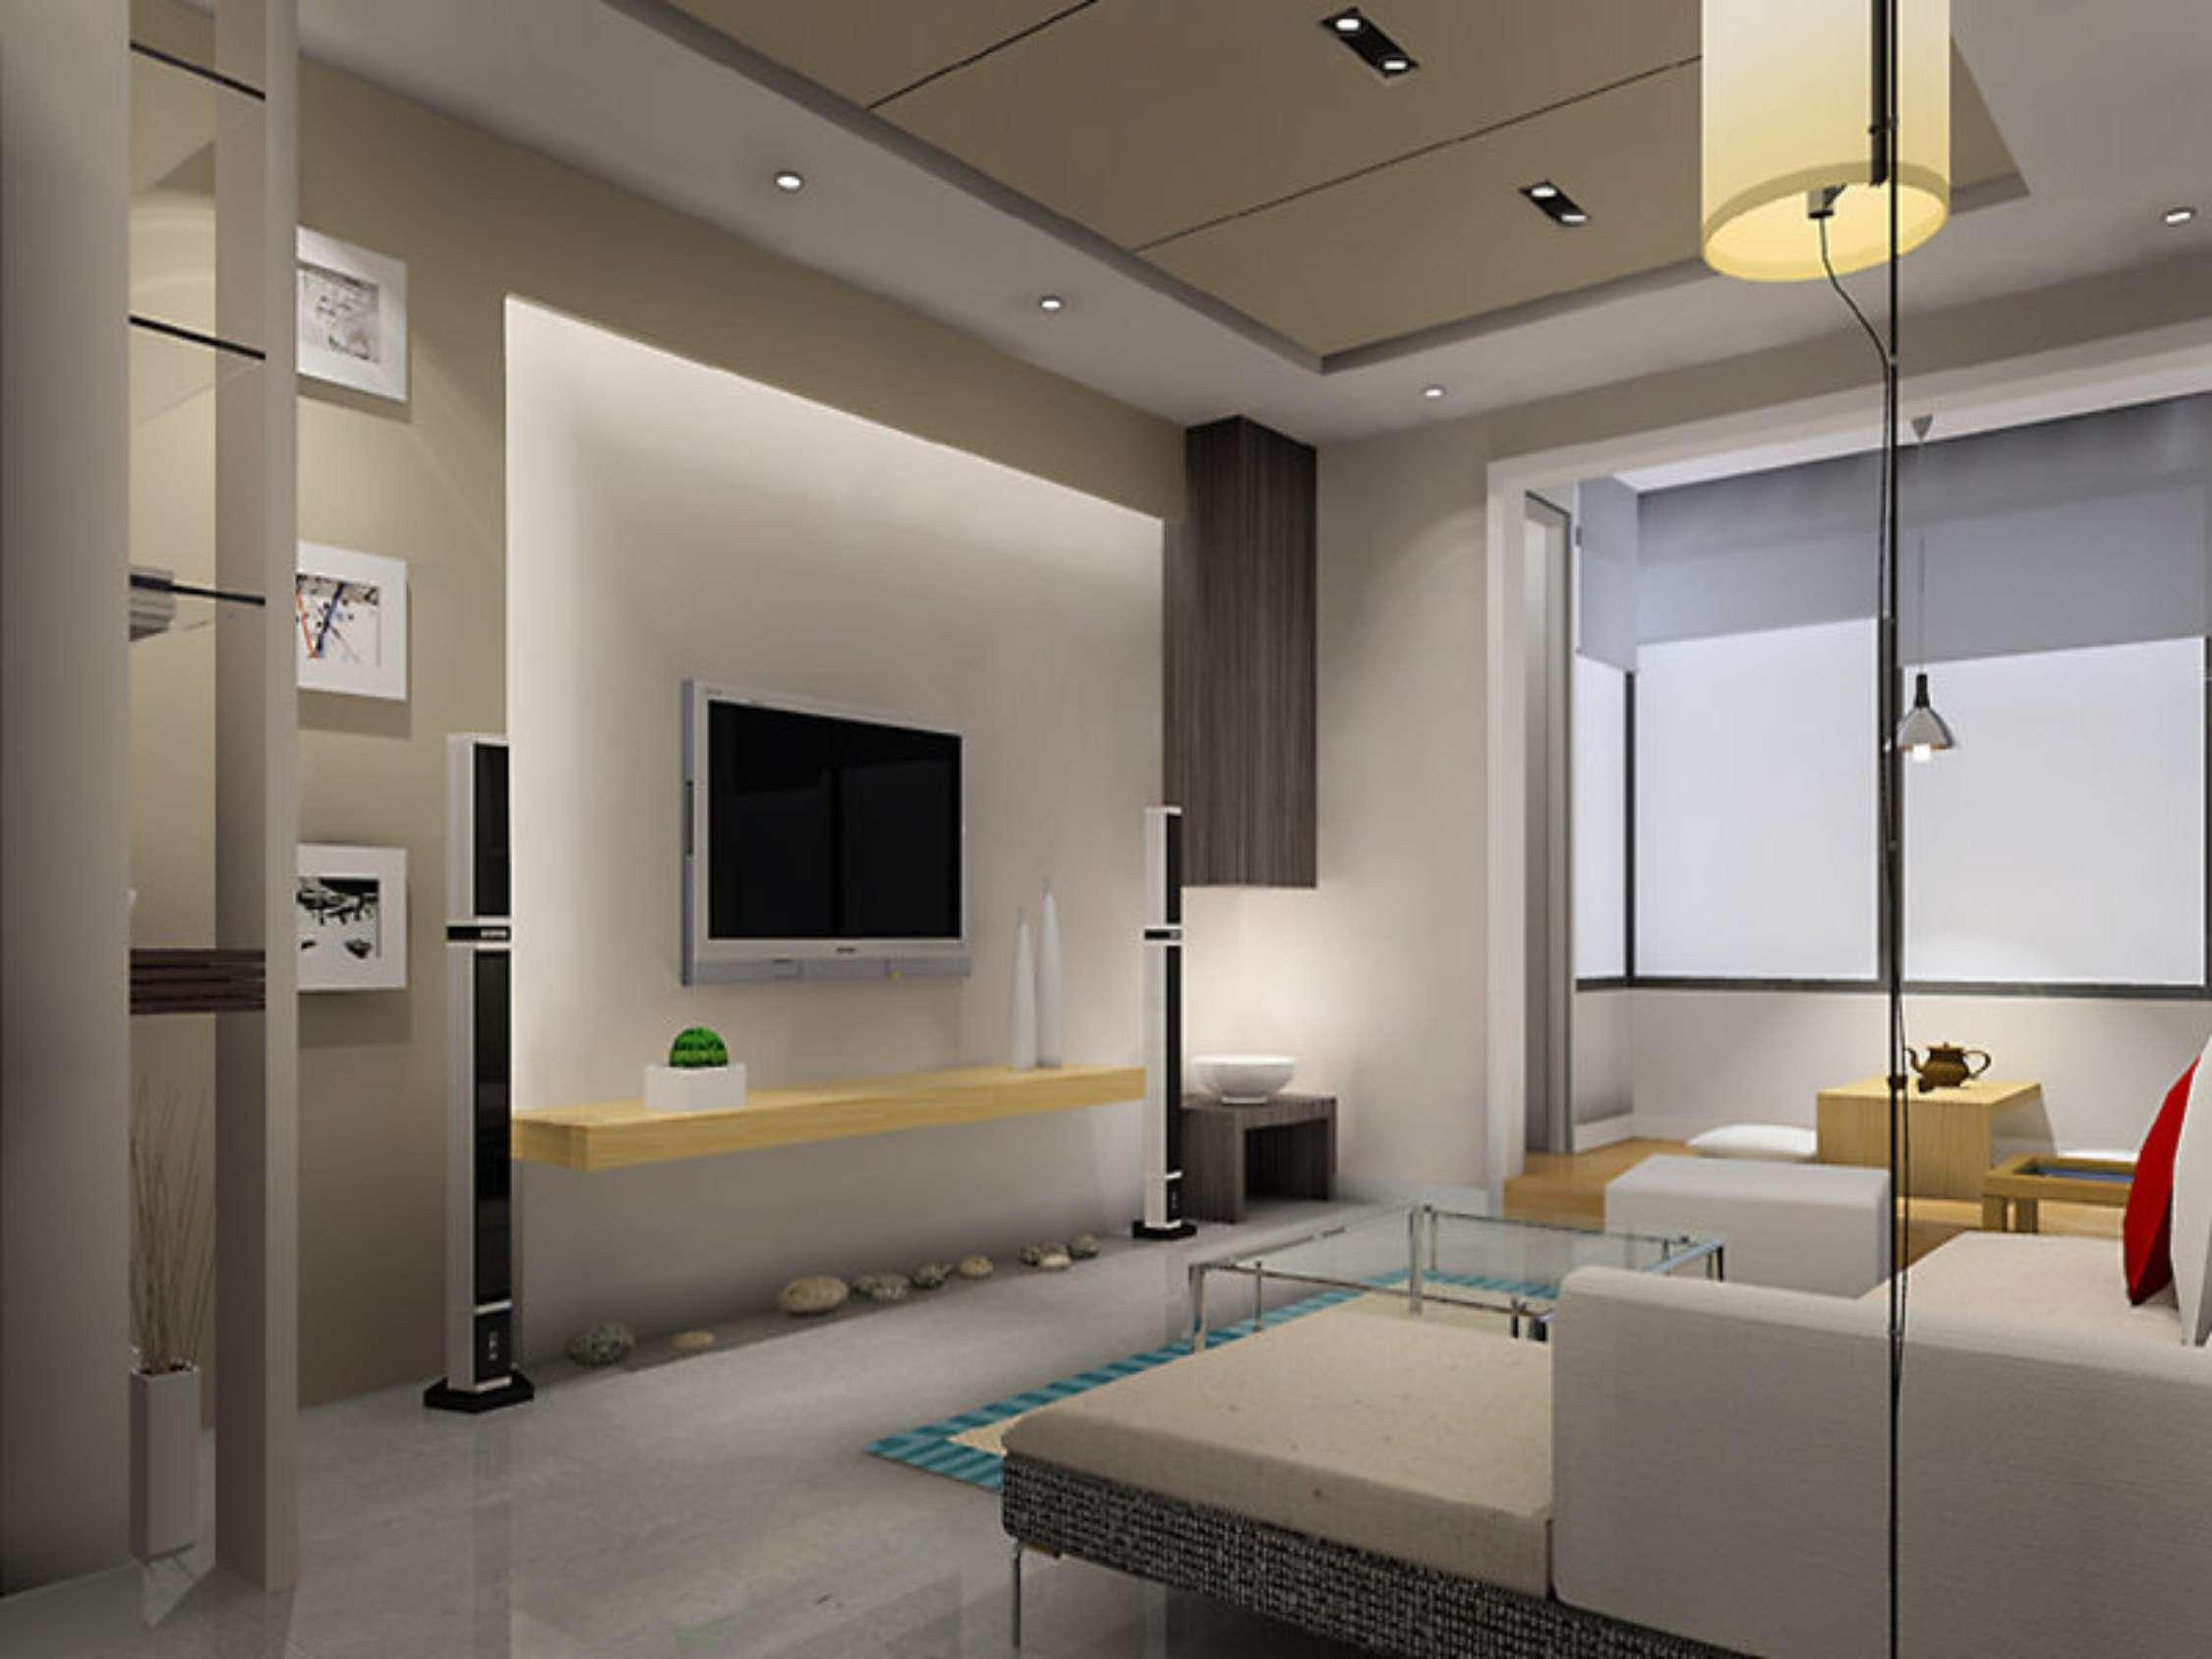 Minimalist Ultra Modern House Plans Design